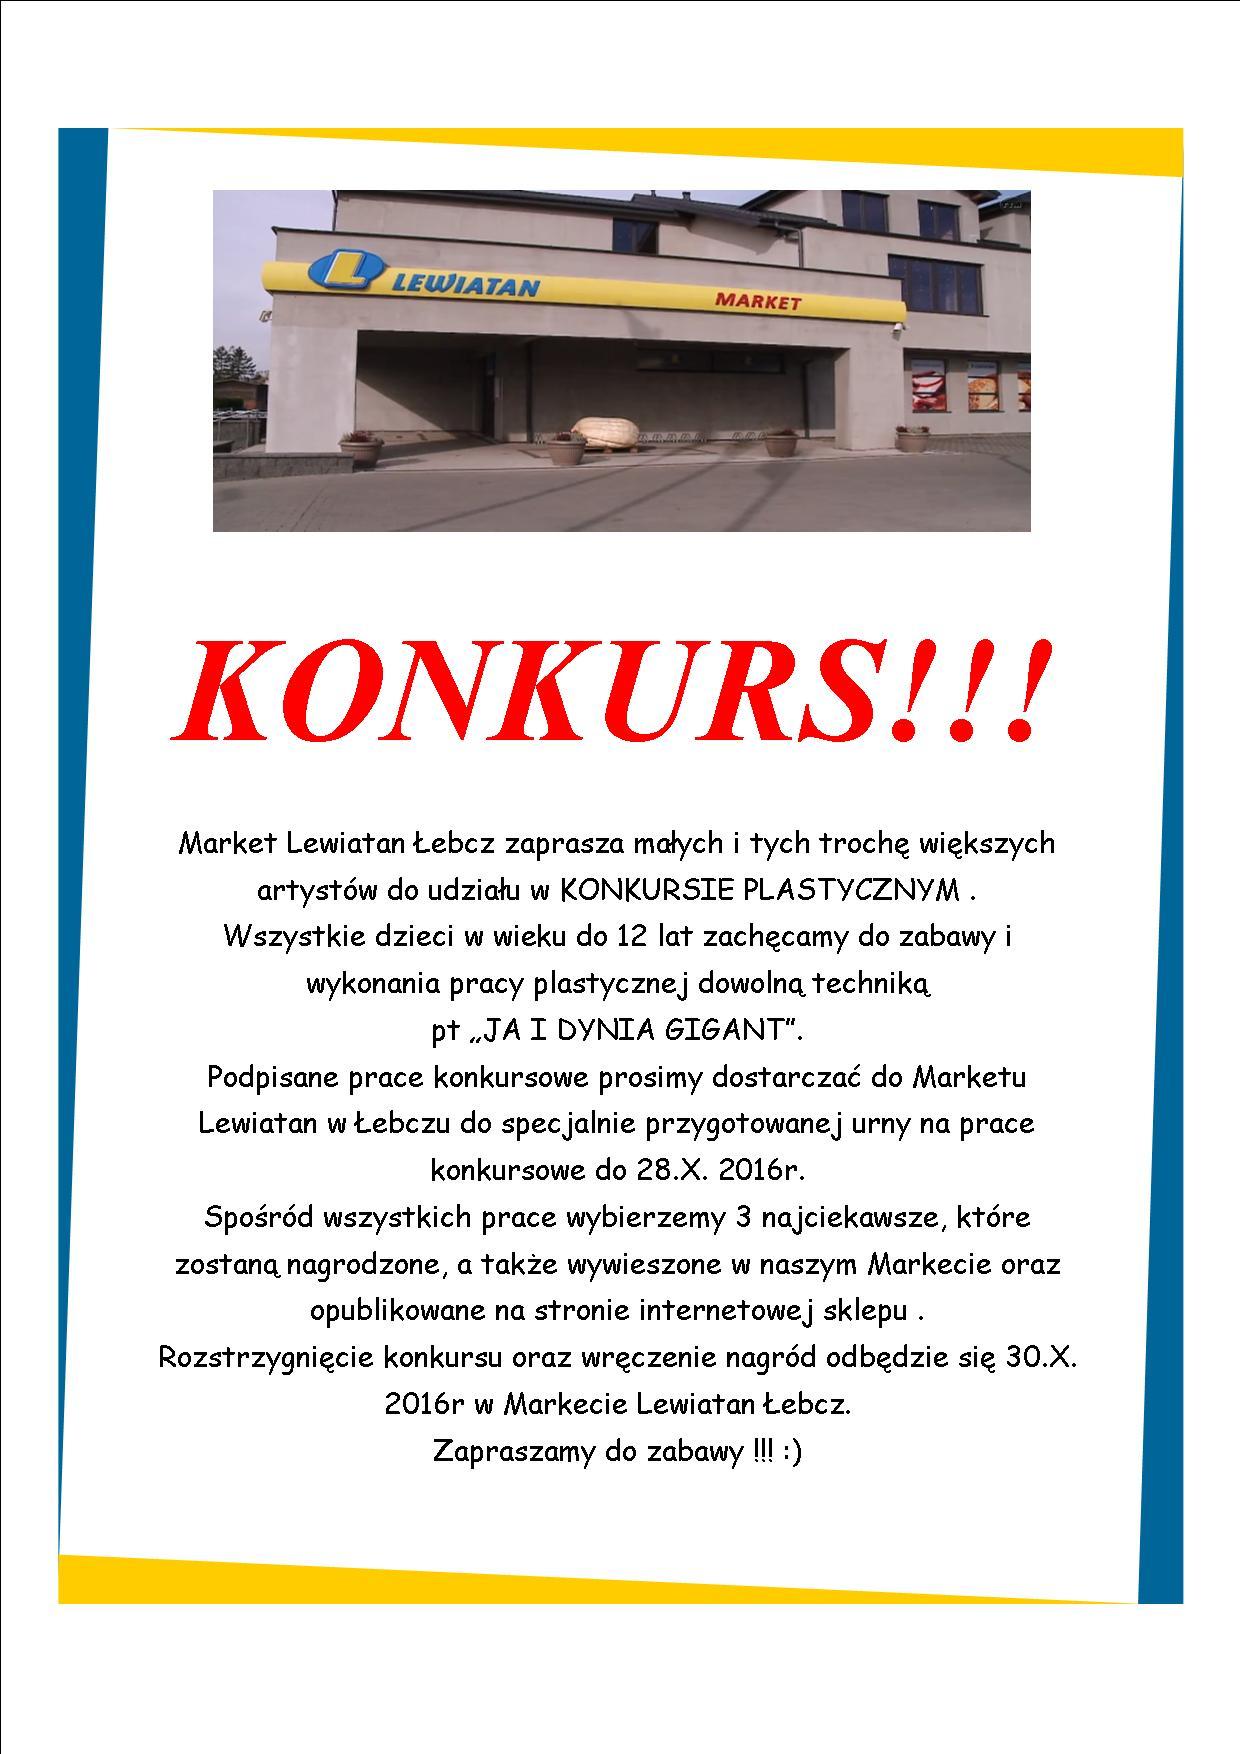 plakat-konkursowy-lebcz-2